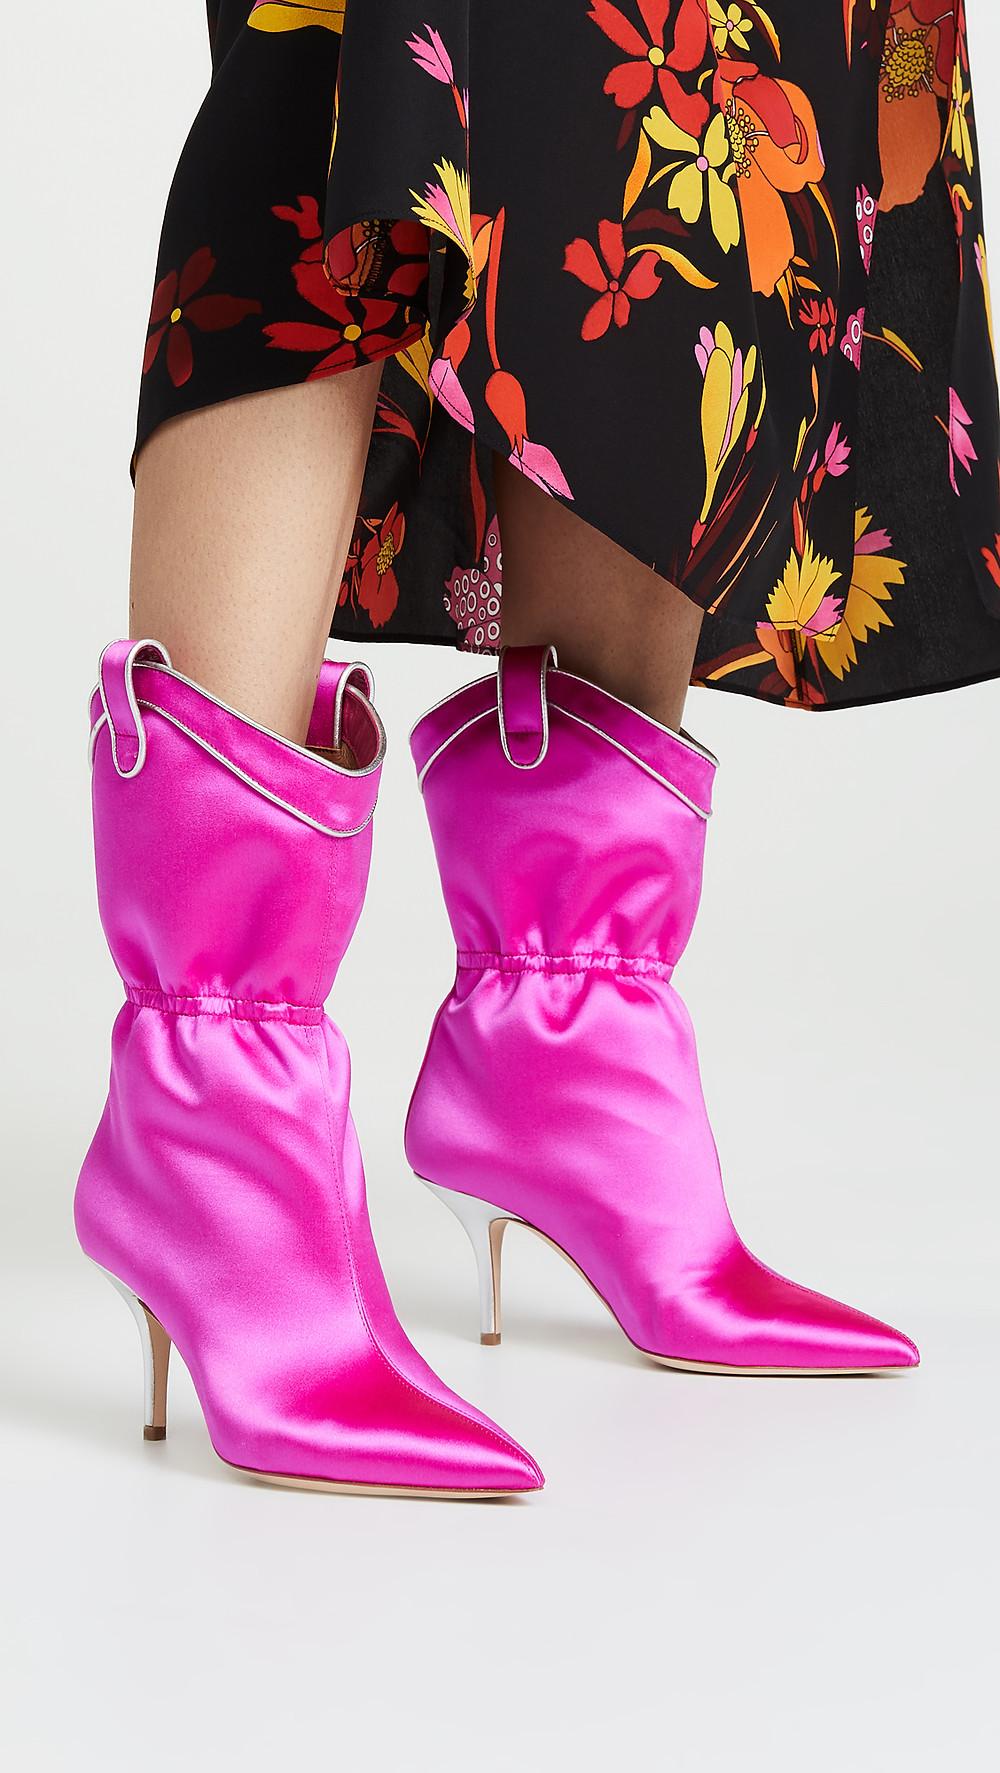 Malone Souliers Daisy Ungaro Boots $795